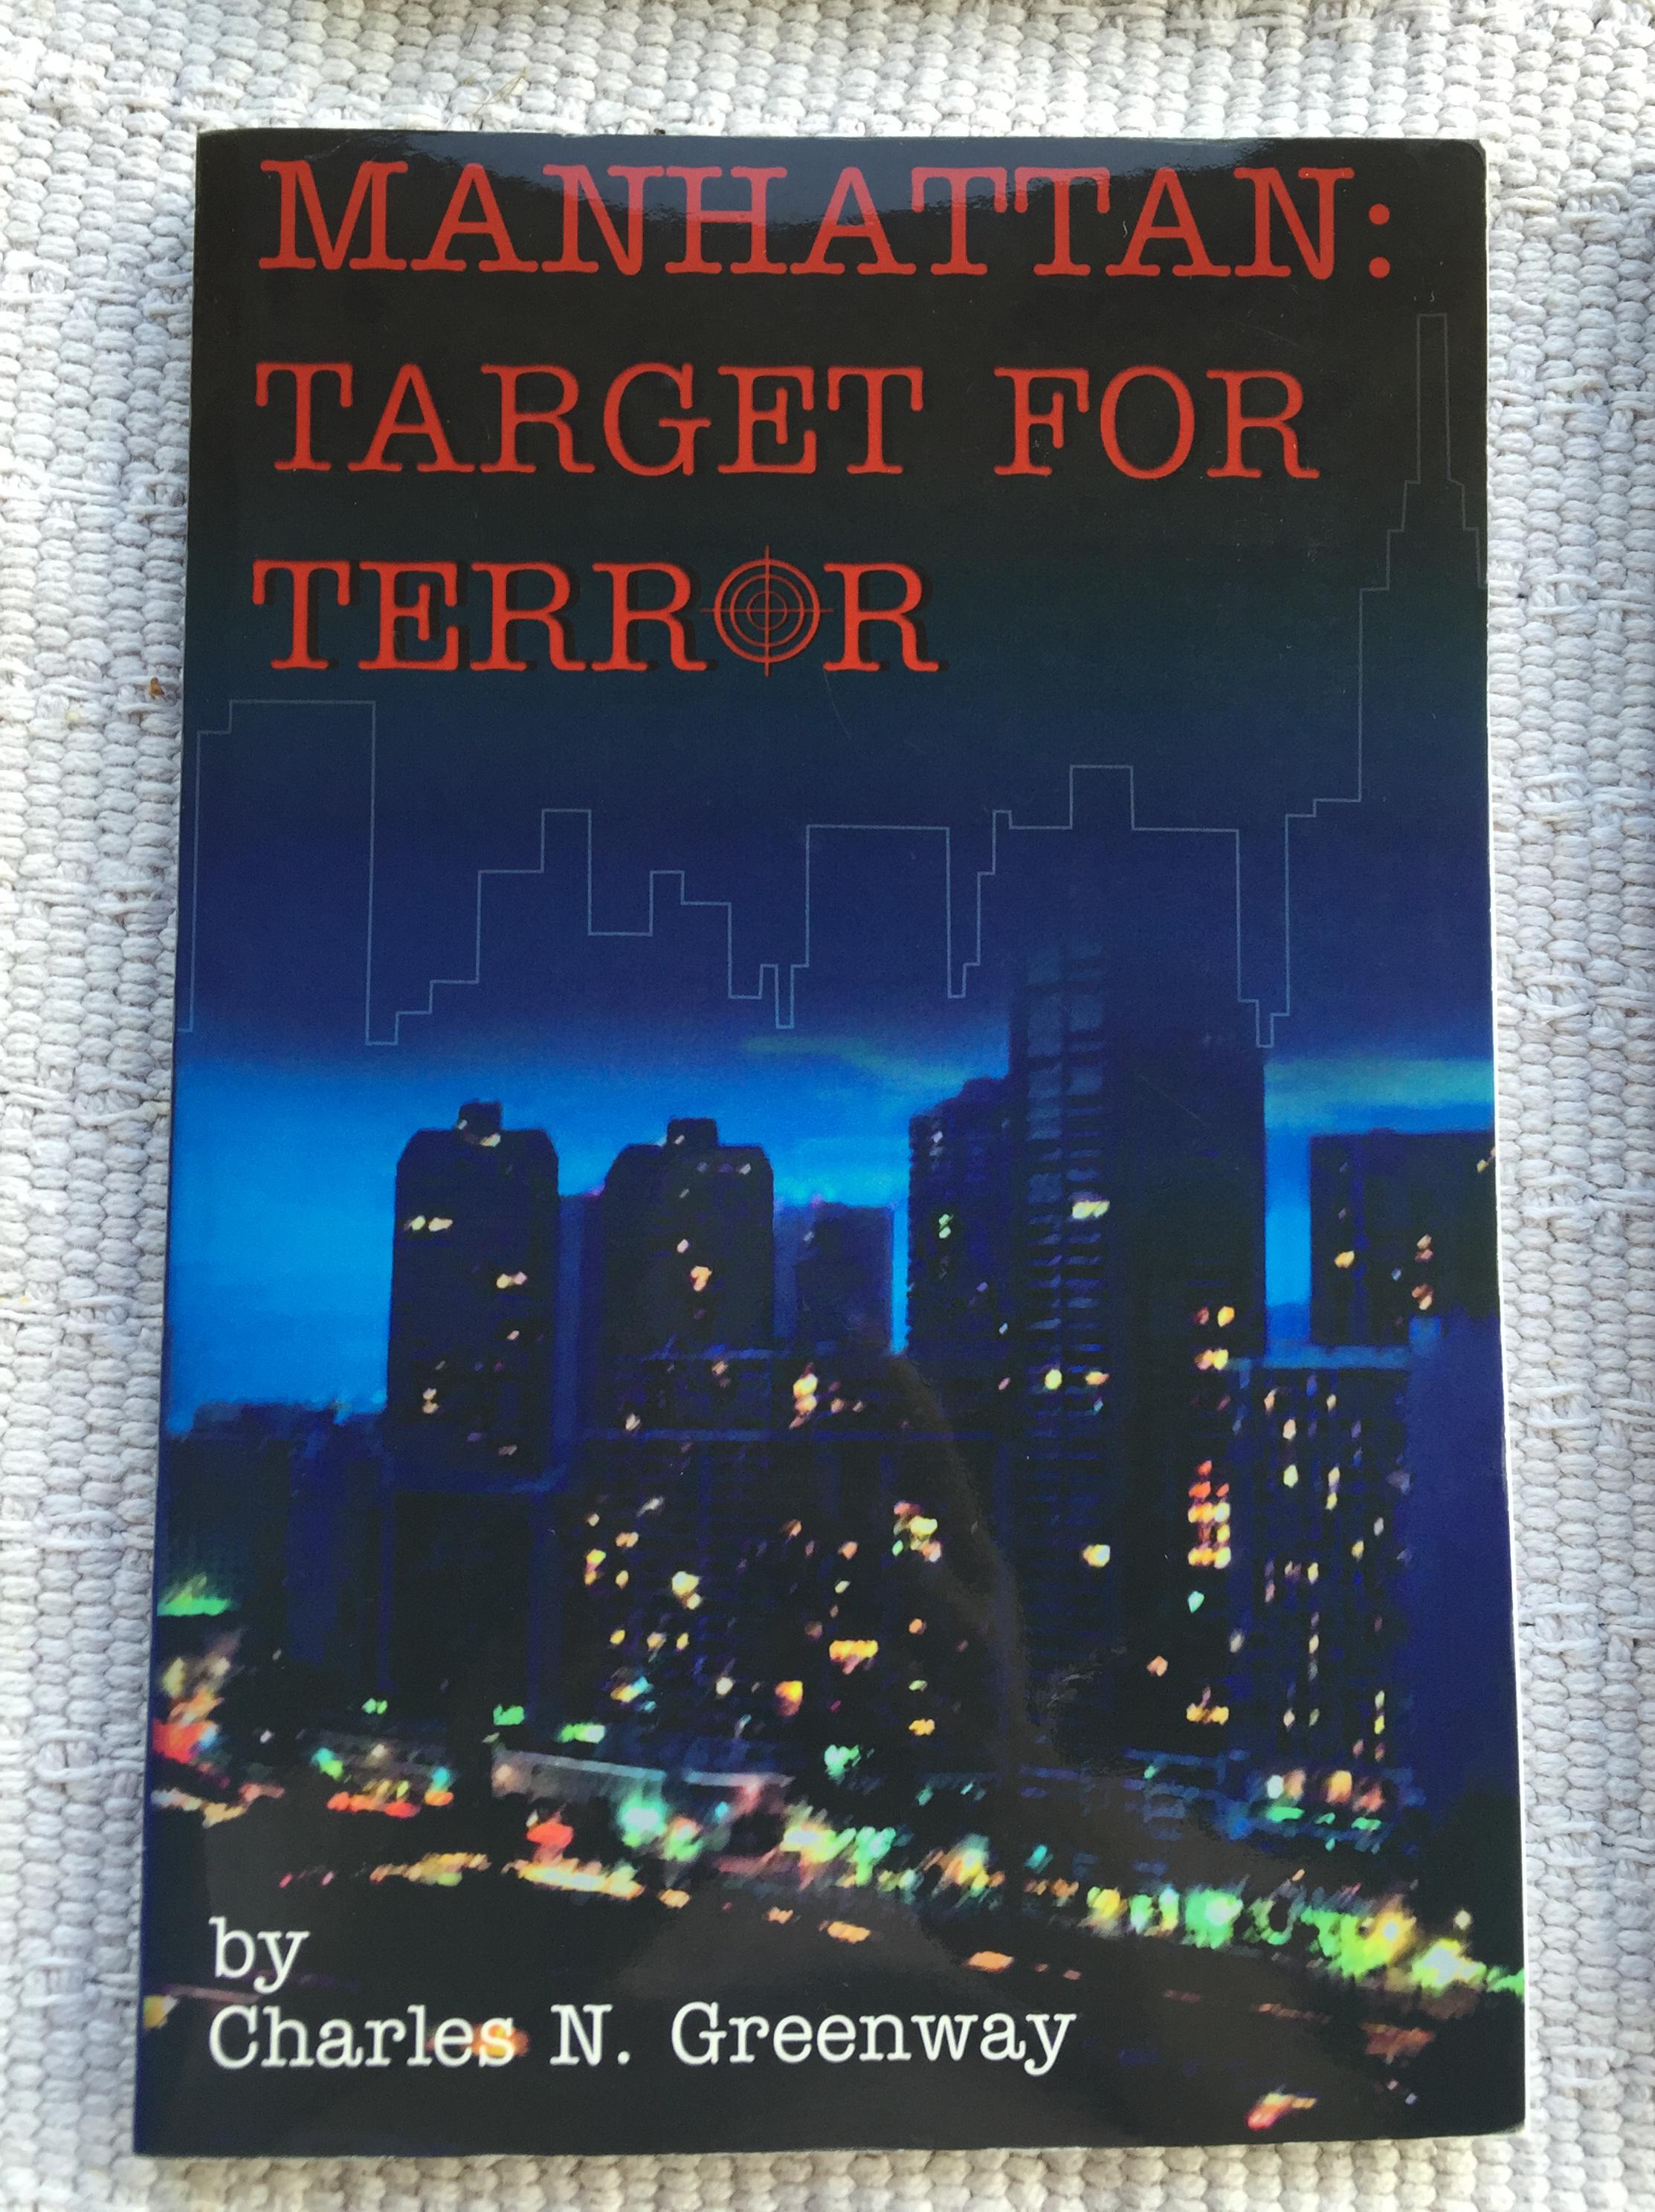 Manhatten-Terror-Cover.png